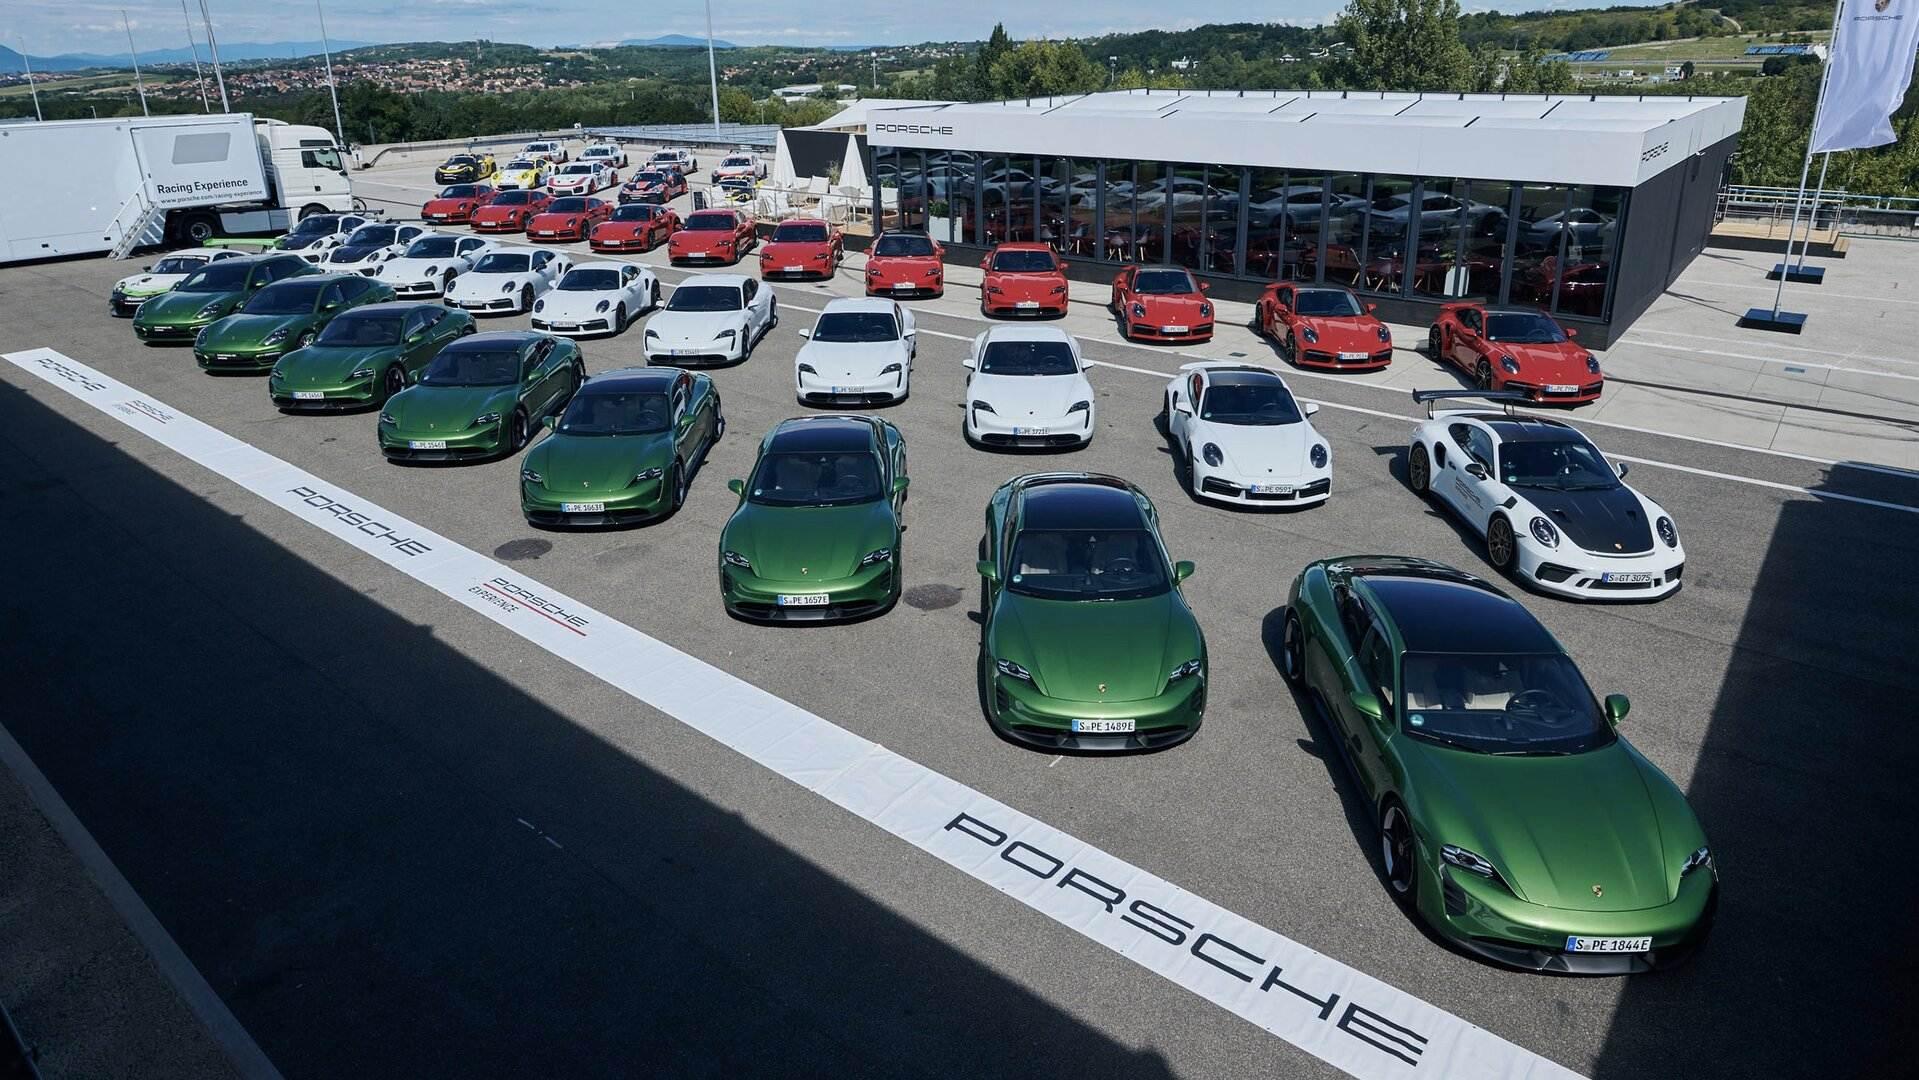 Porsche turbo charging 4